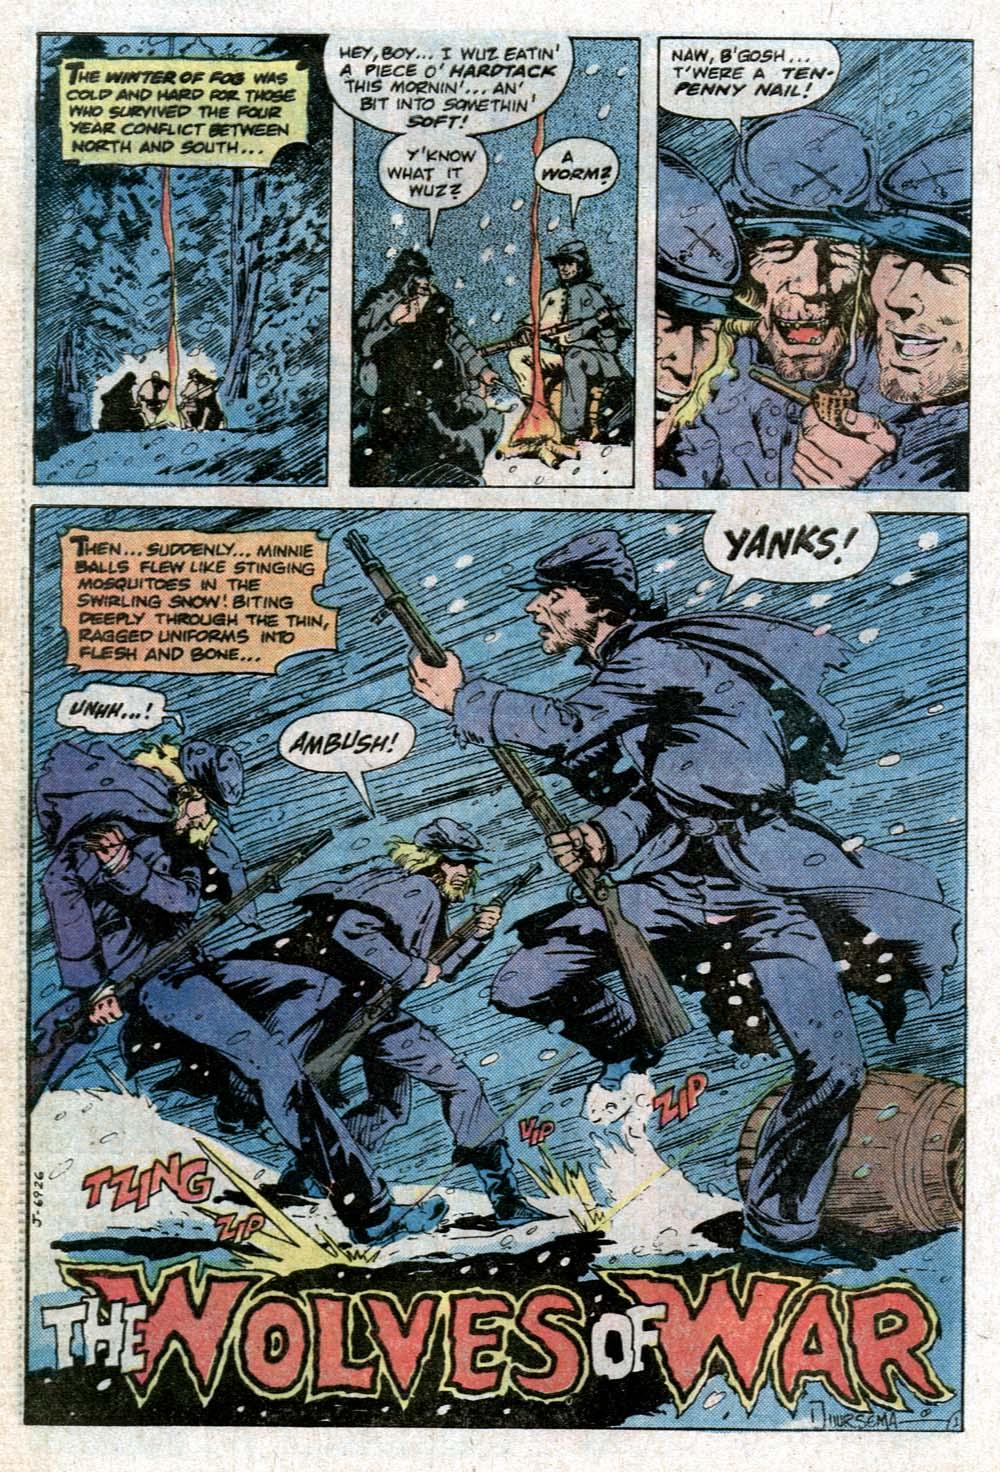 Read online Sgt. Rock comic -  Issue #352 - 27